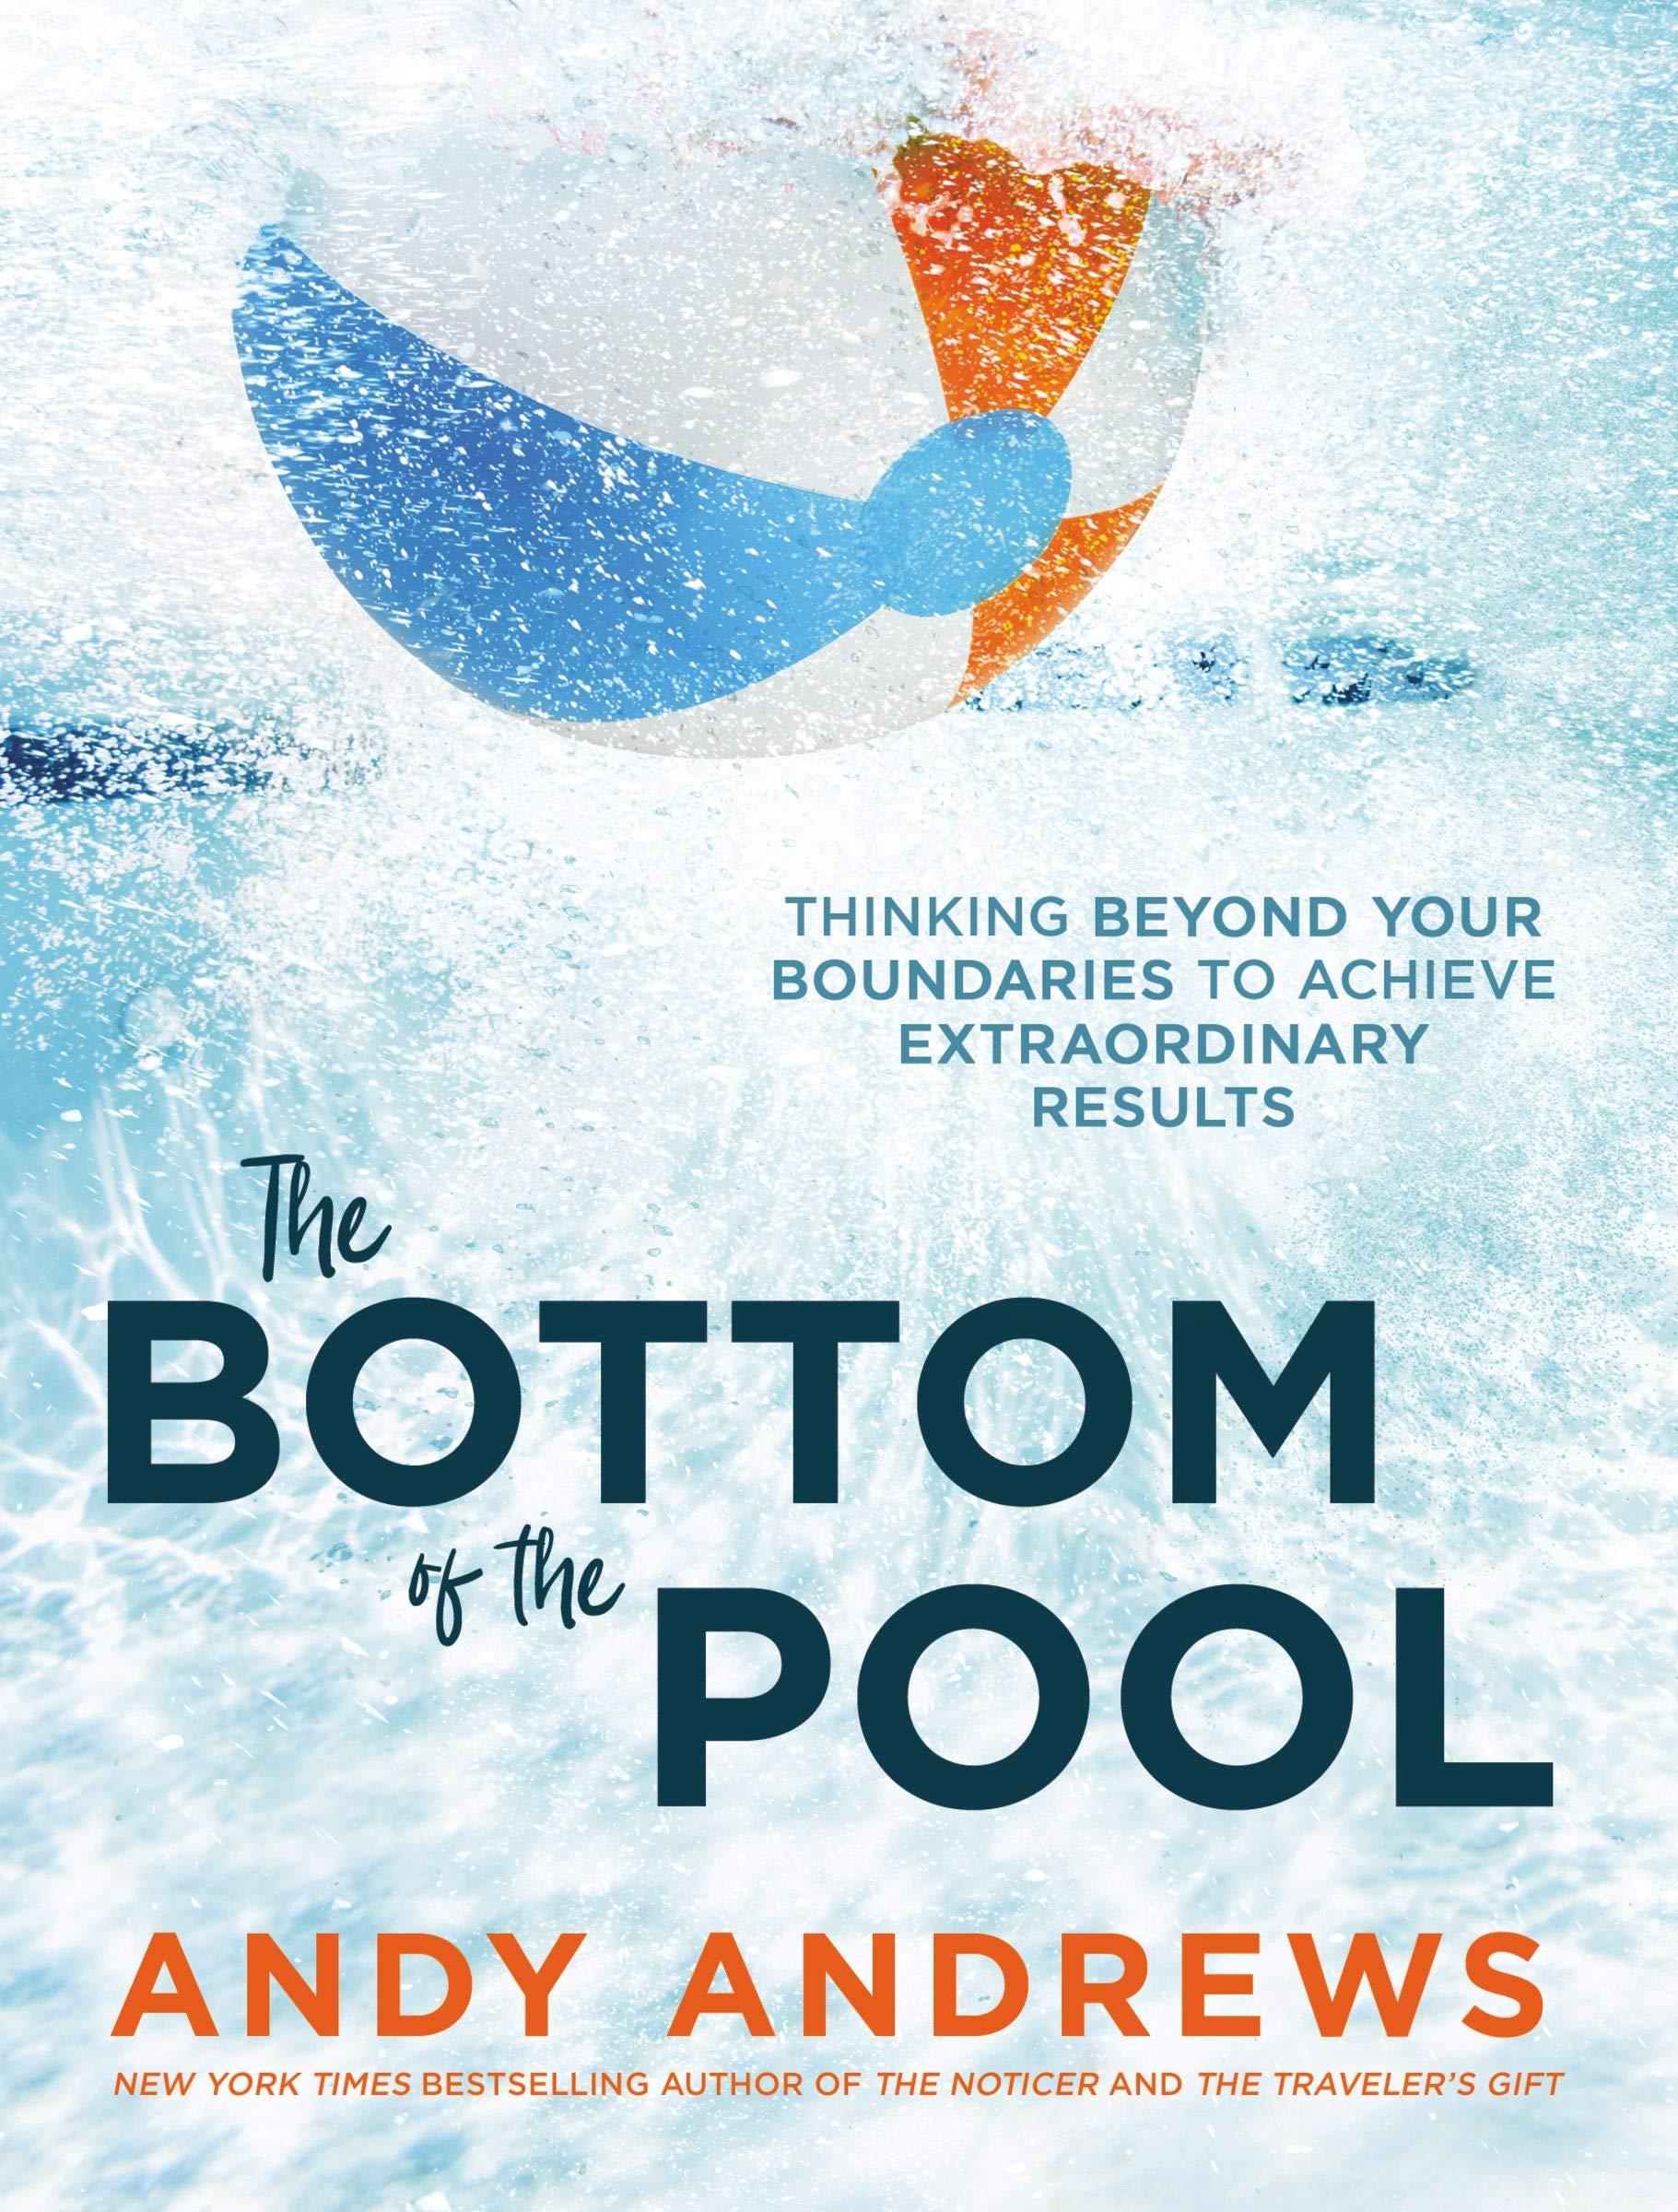 Bottom Pool Thinking Boundaries Extraordinary